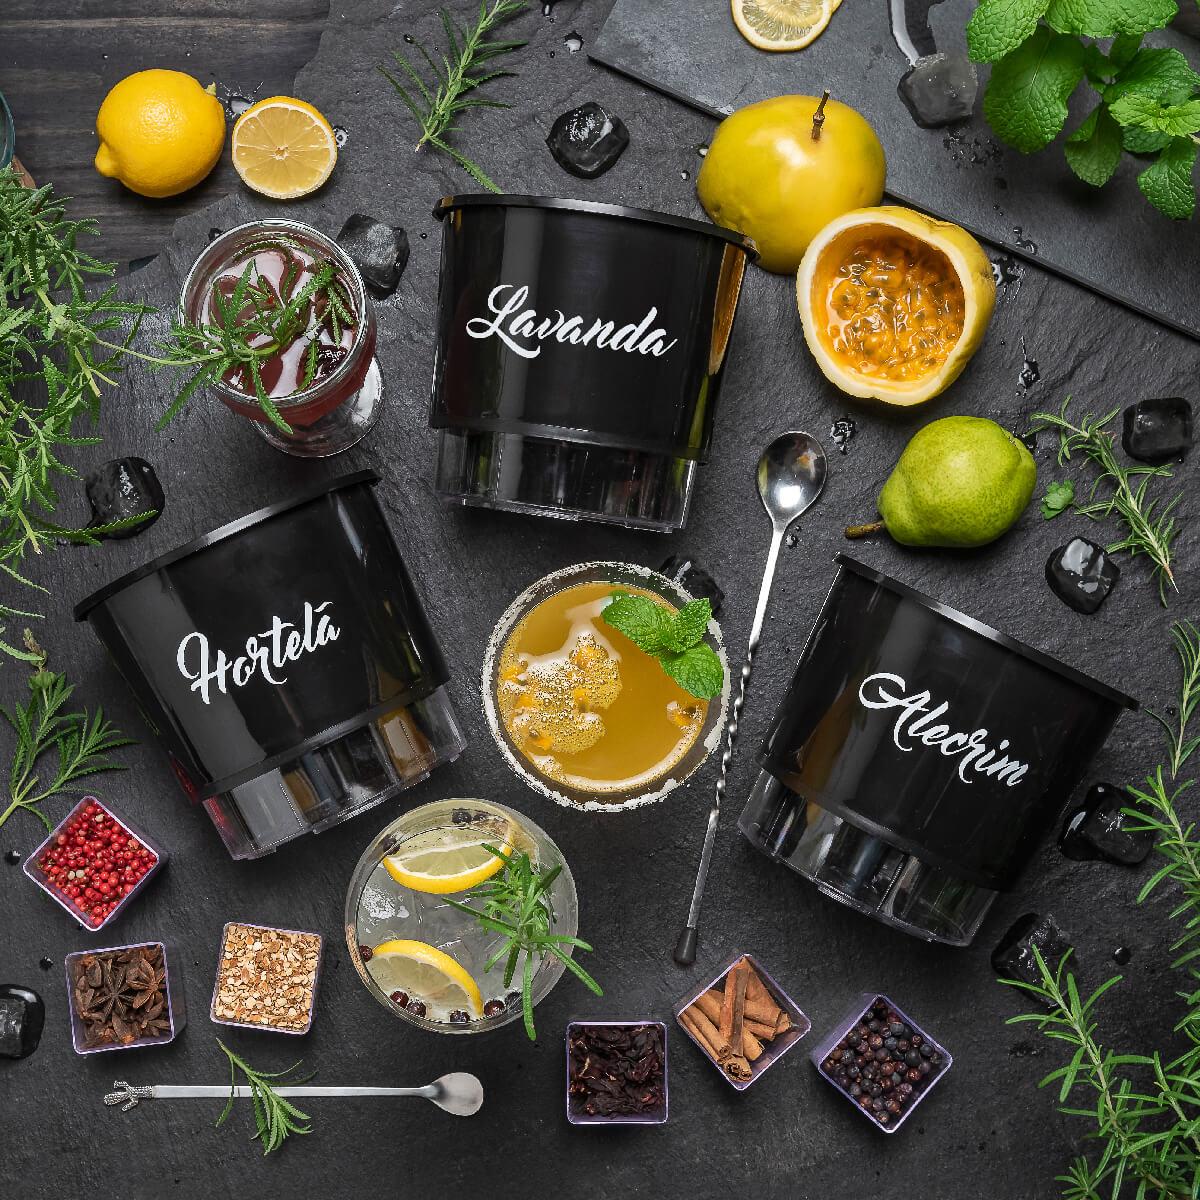 Kit Plantio Completo Gourmet Drinks  - Vasos Raiz Loja Oficial